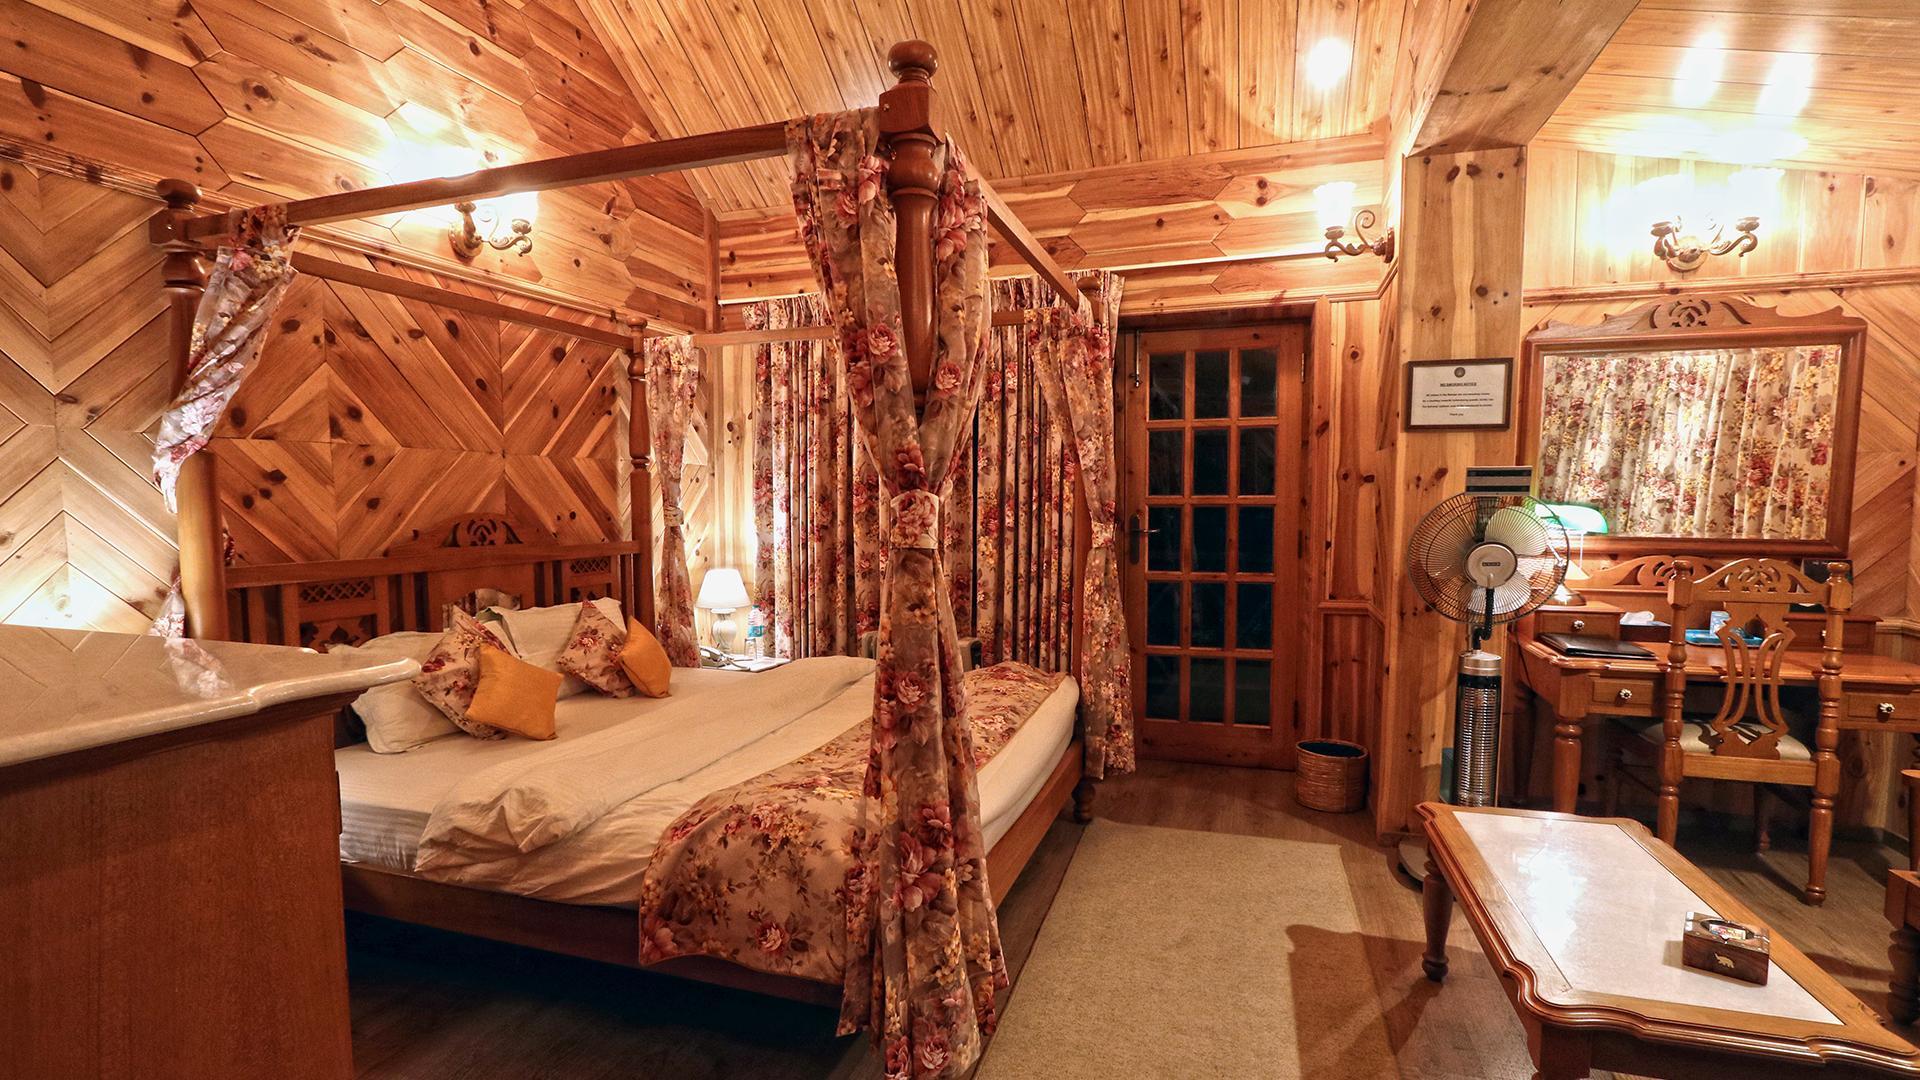 Deluxe Room image 1 at WelcomHeritage Urvashi's Retreat by Kullu, Himachal Pradesh, India